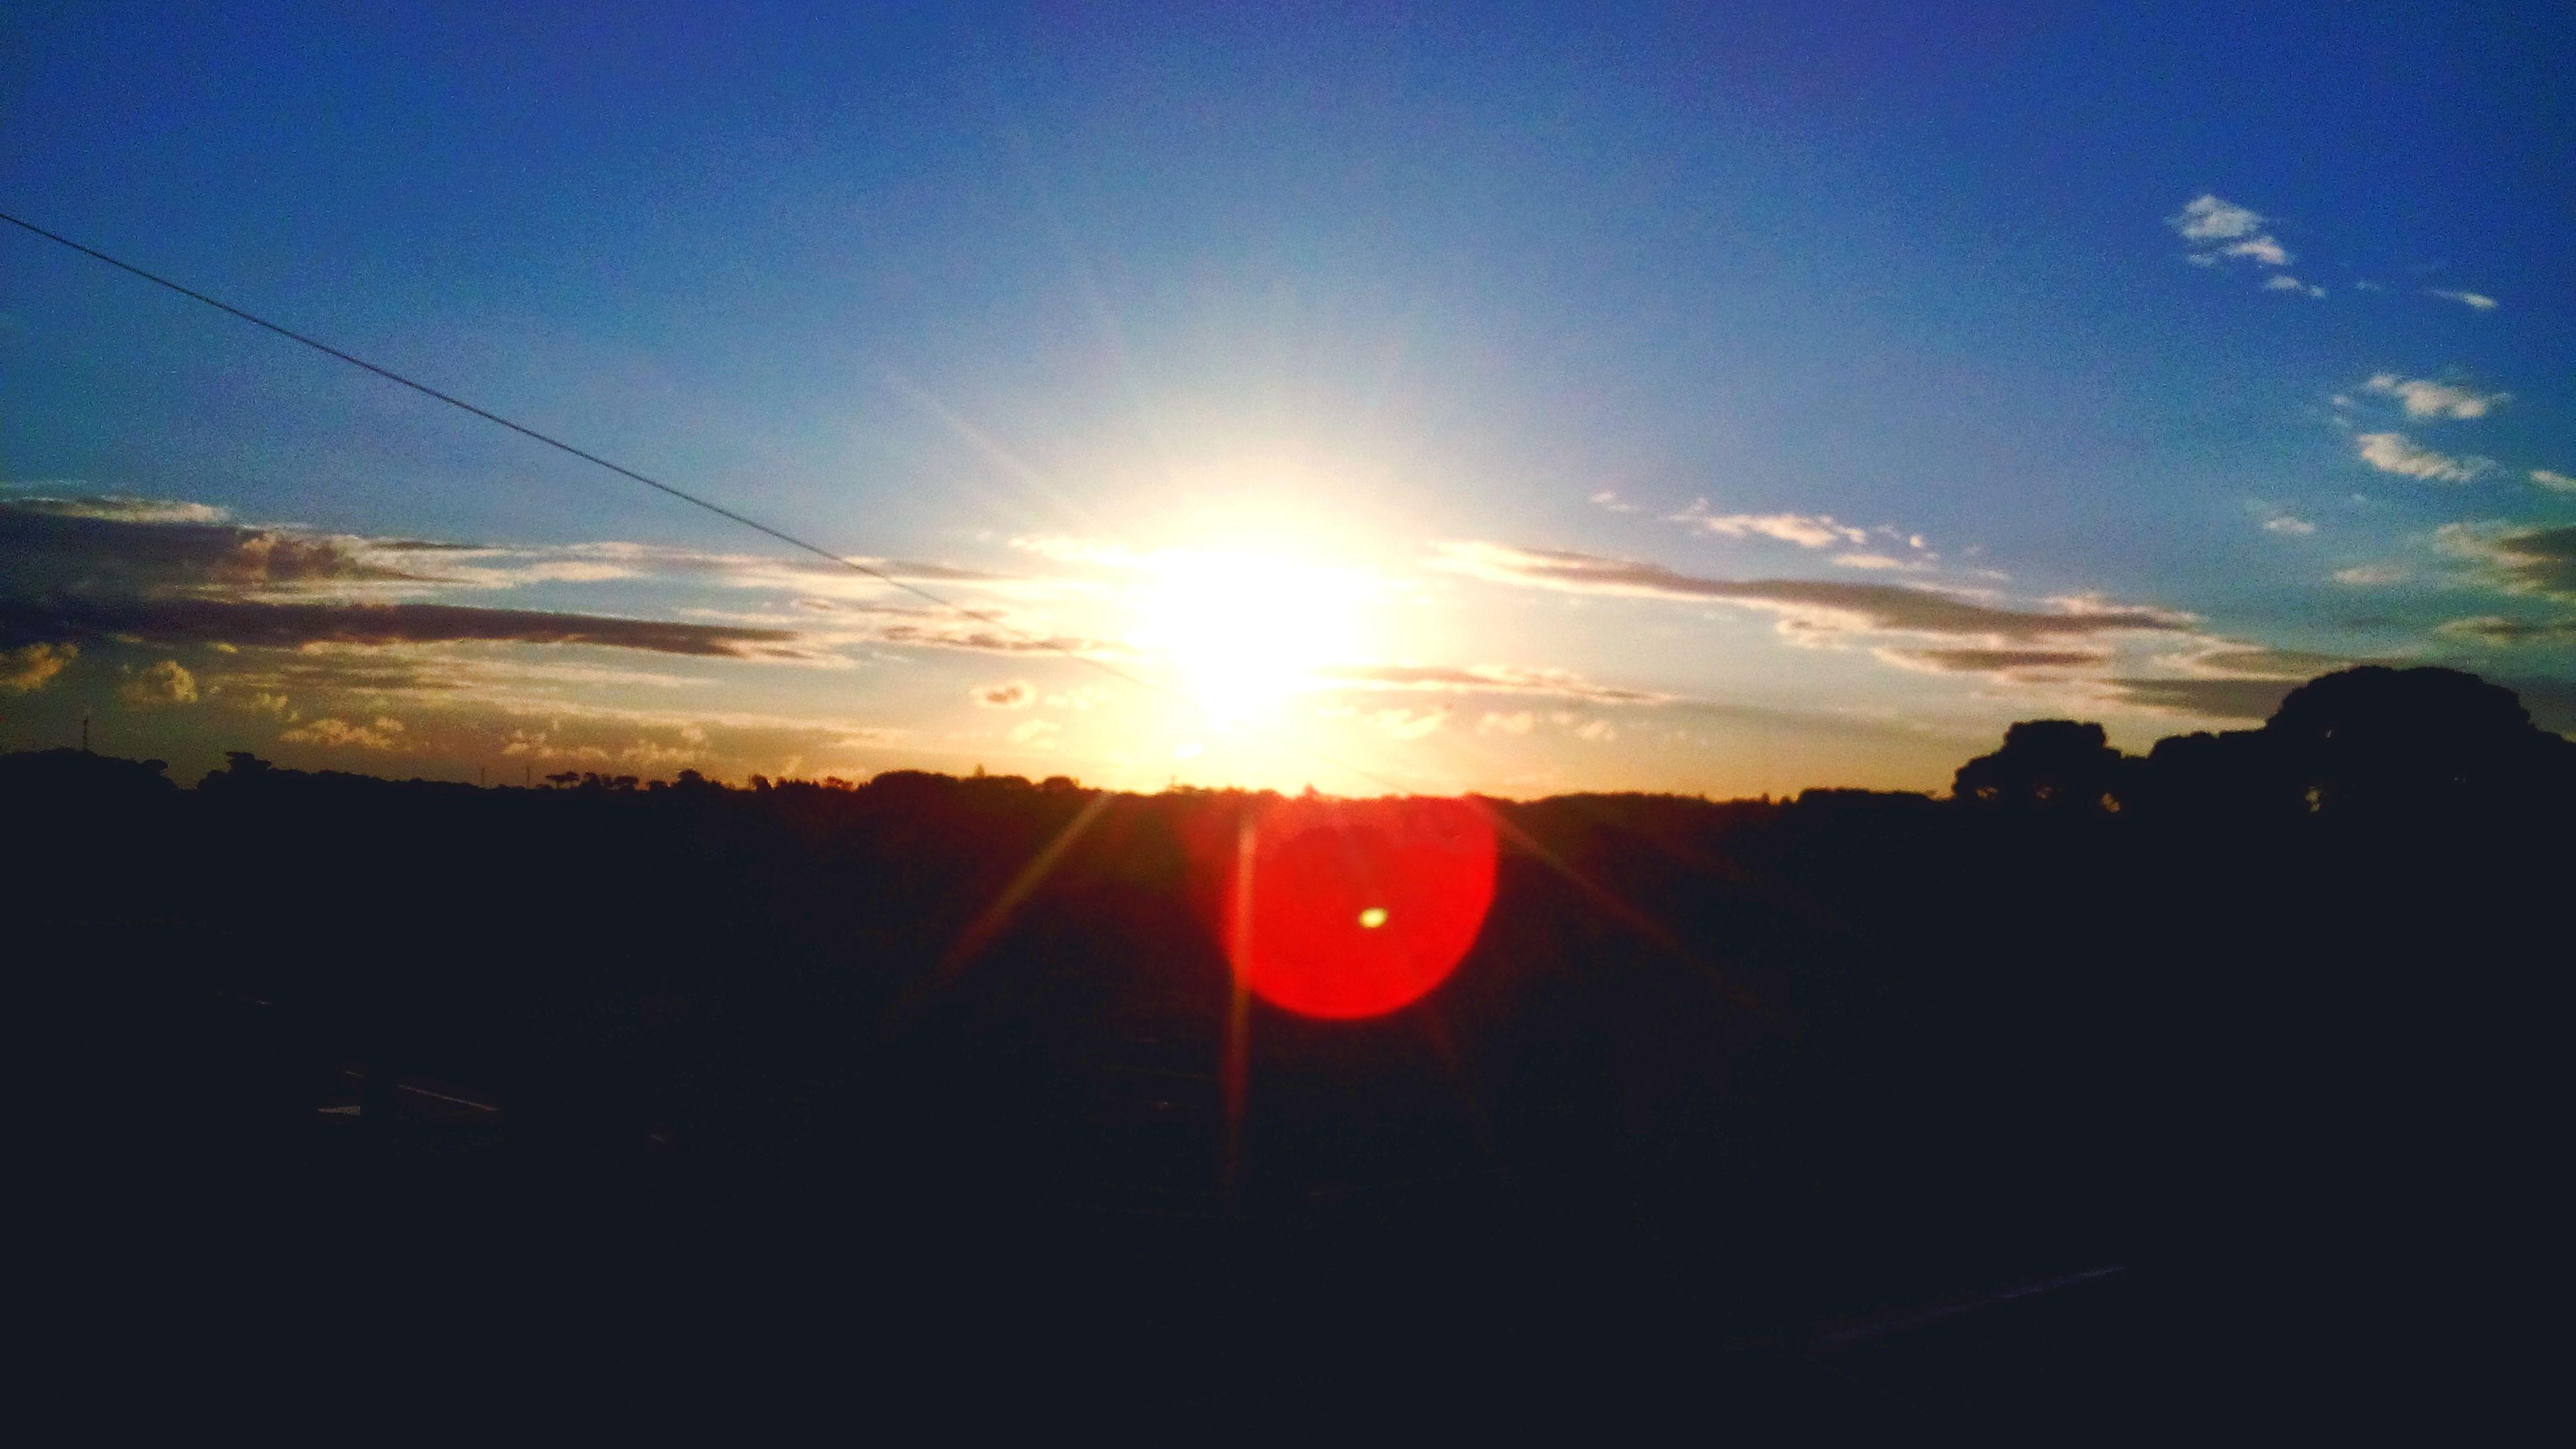 sun, sunset, silhouette, sunlight, sunbeam, lens flare, sky, tranquility, tranquil scene, scenics, beauty in nature, nature, landscape, idyllic, orange color, back lit, outdoors, bright, dark, no people